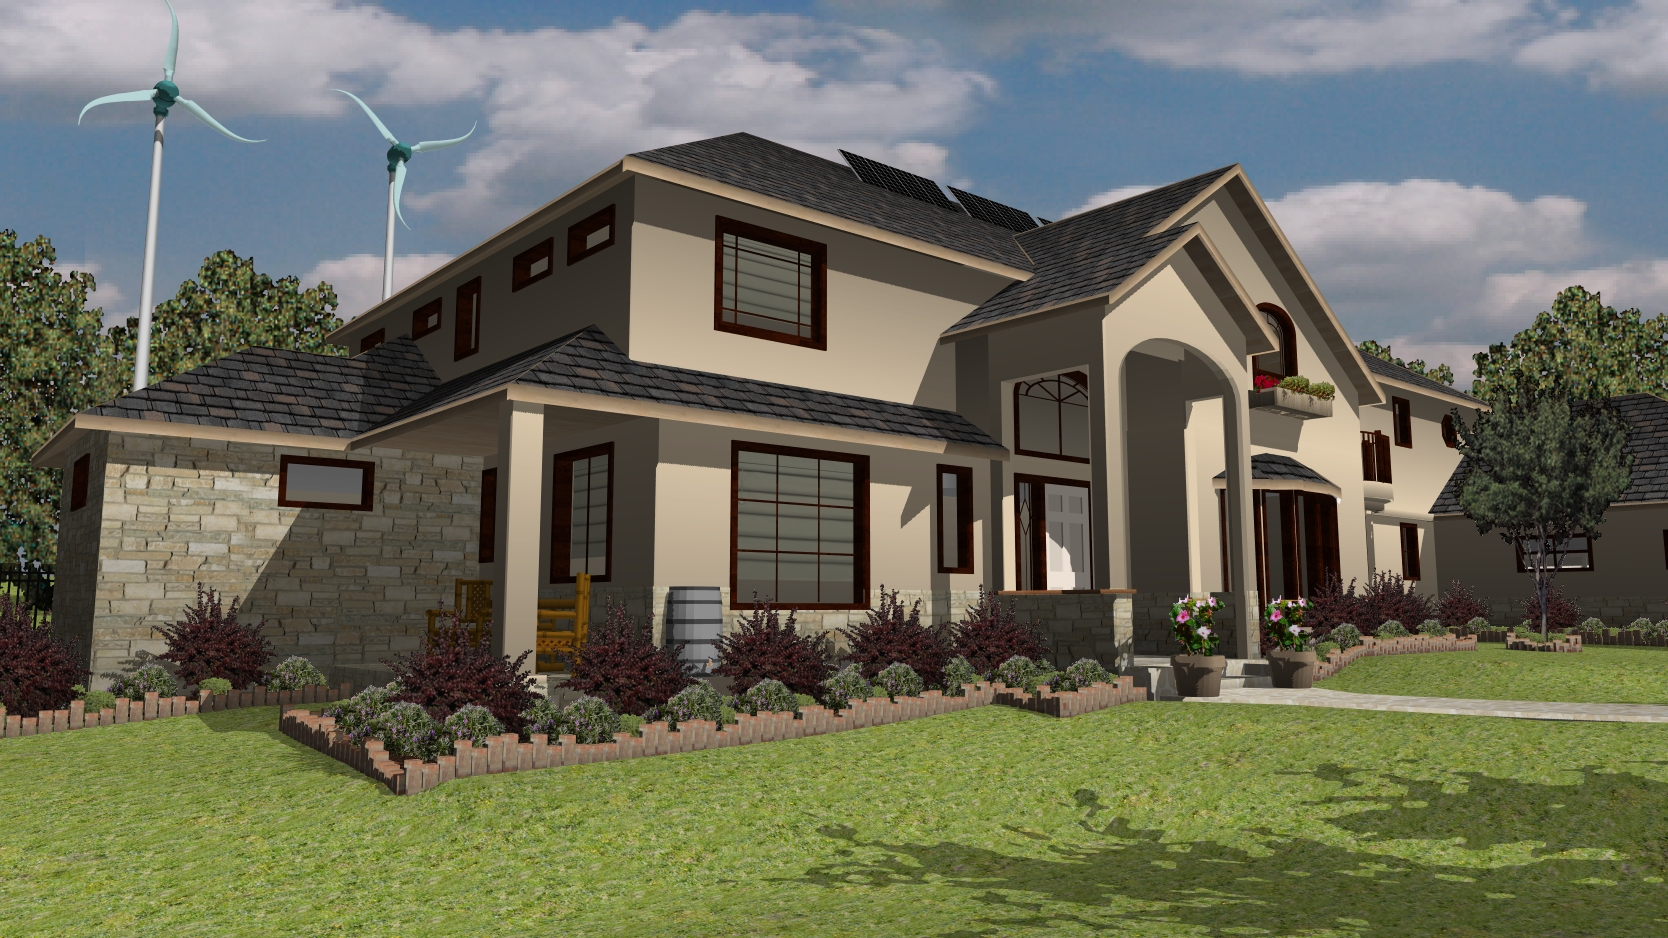 6nw Punch Home Design Edepremcom Home Design Studio Pro Edepremcom On 3d Home Architect Design Suite